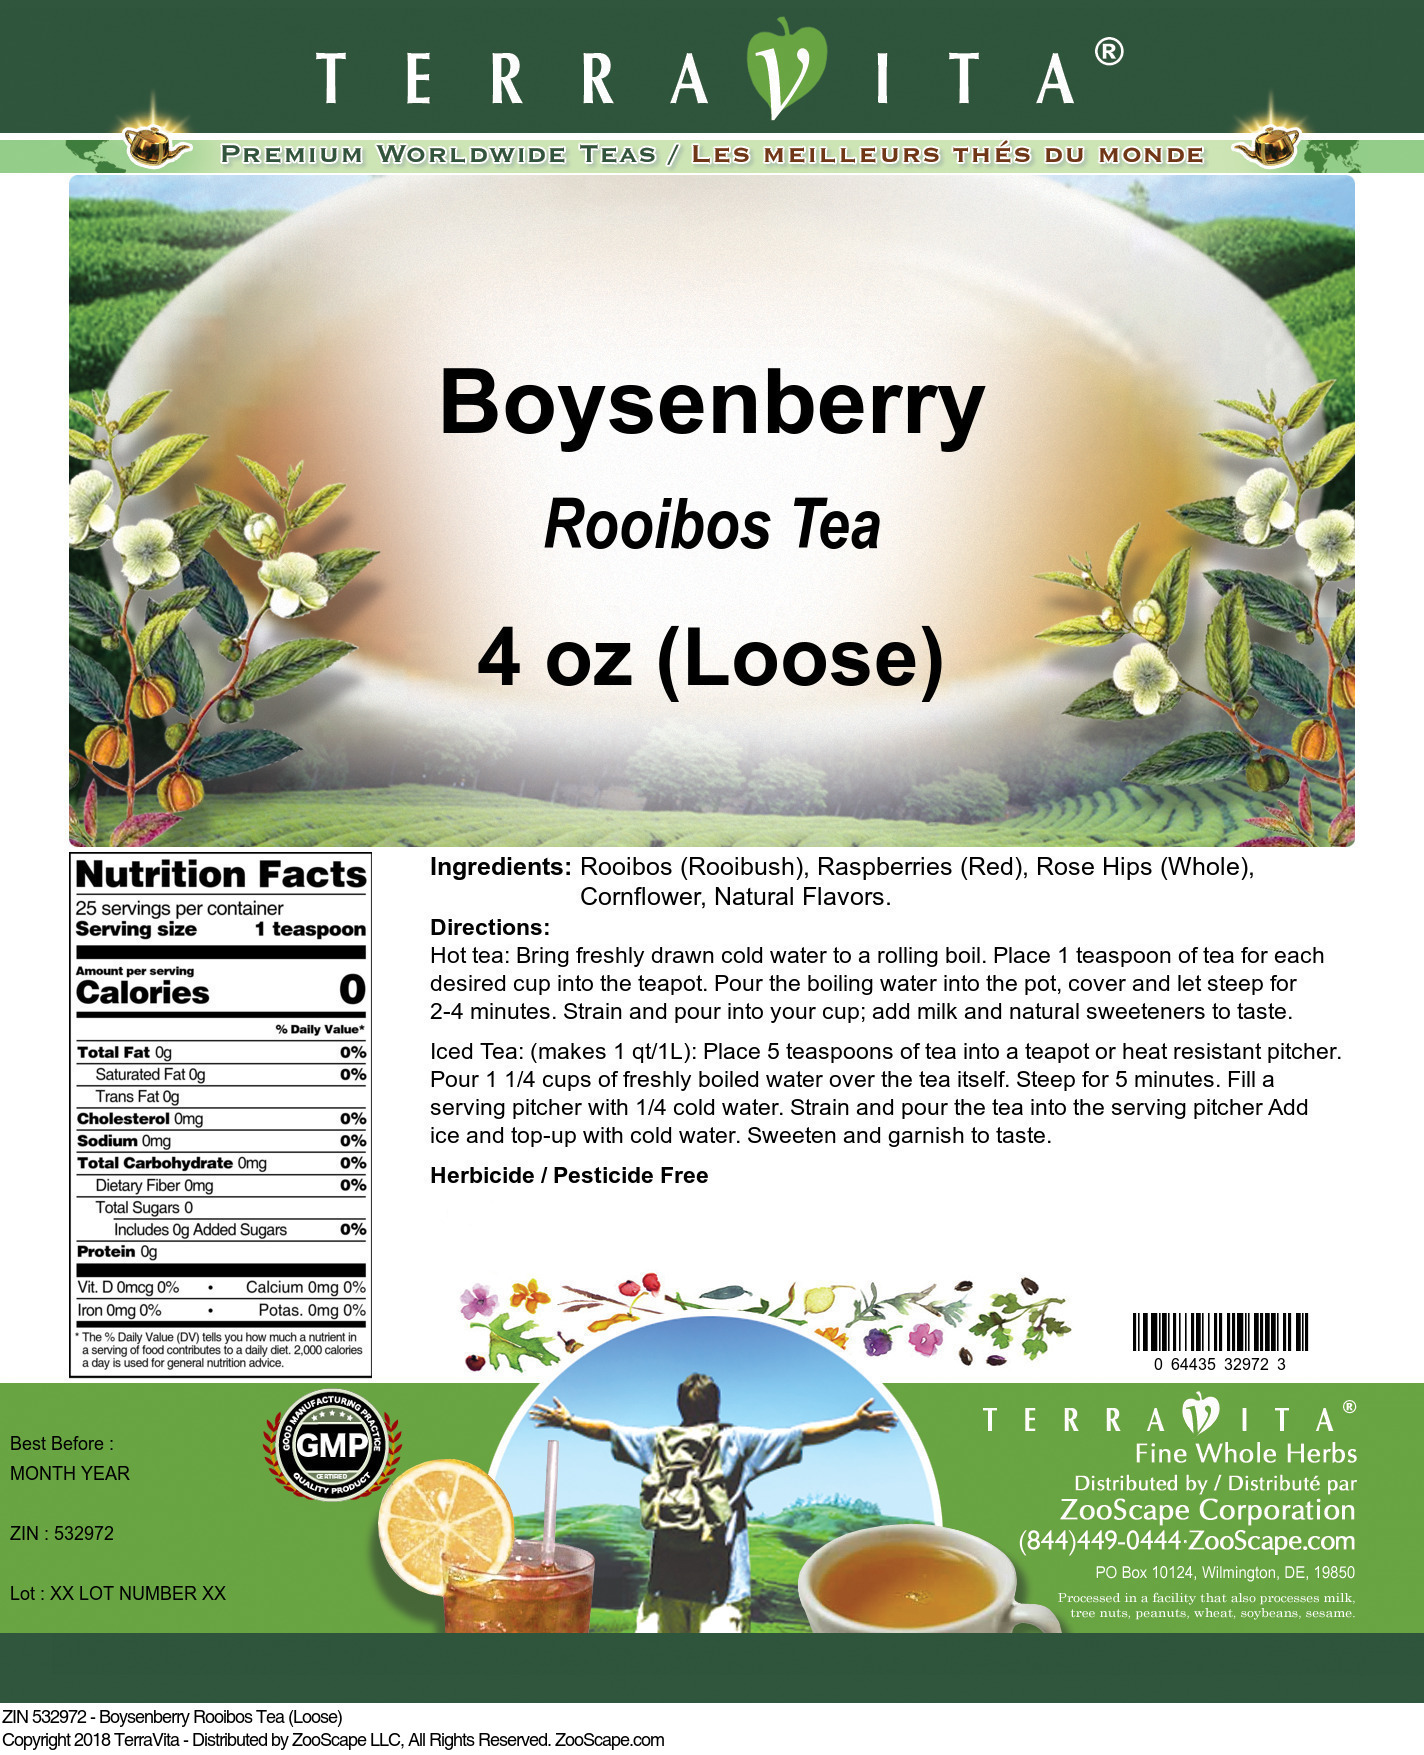 Boysenberry Rooibos Tea (Loose)